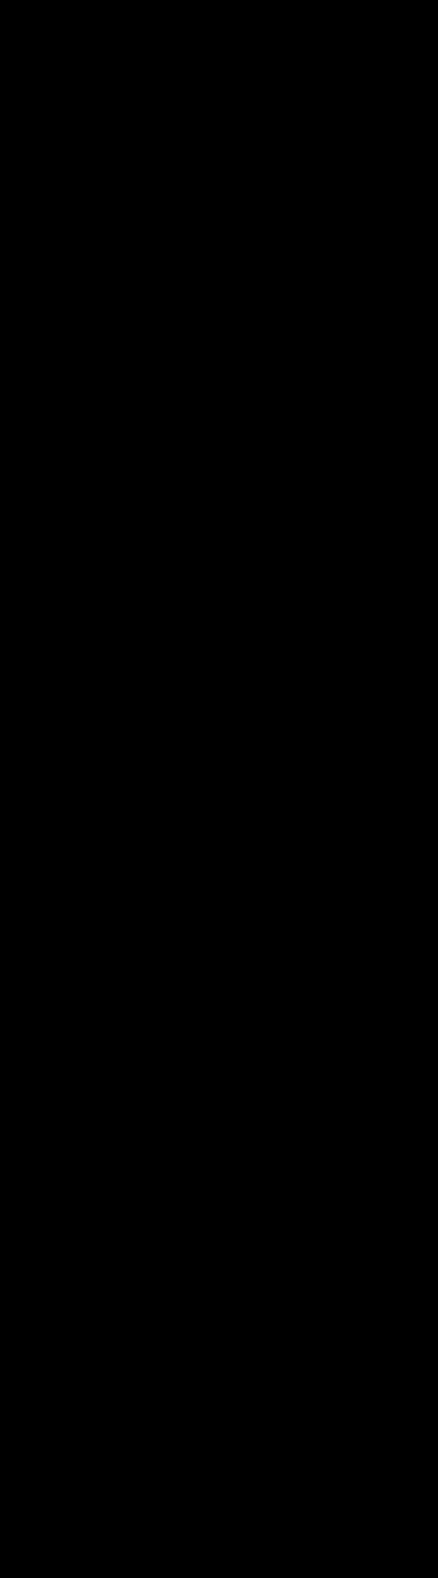 Image-eightC